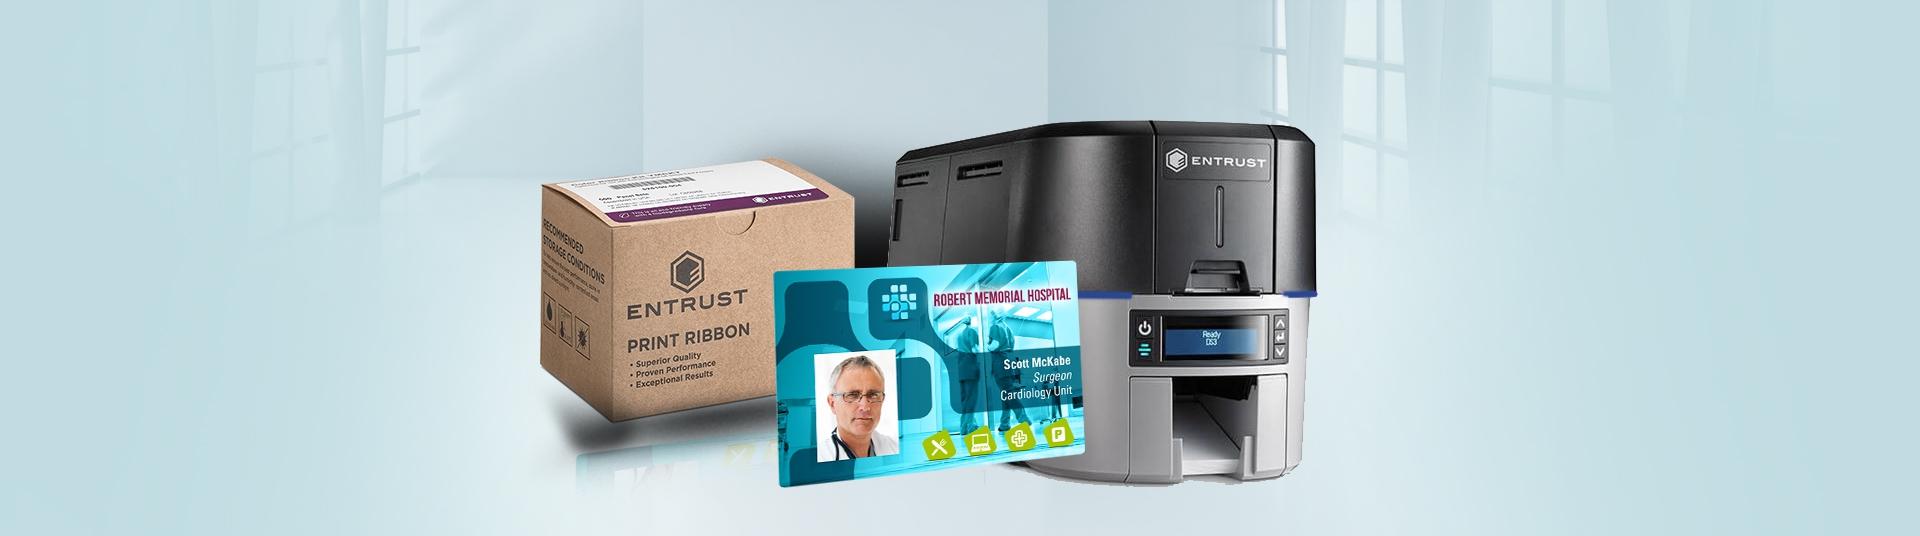 Entrust Datacard Sigma SL3 ID Card Printers